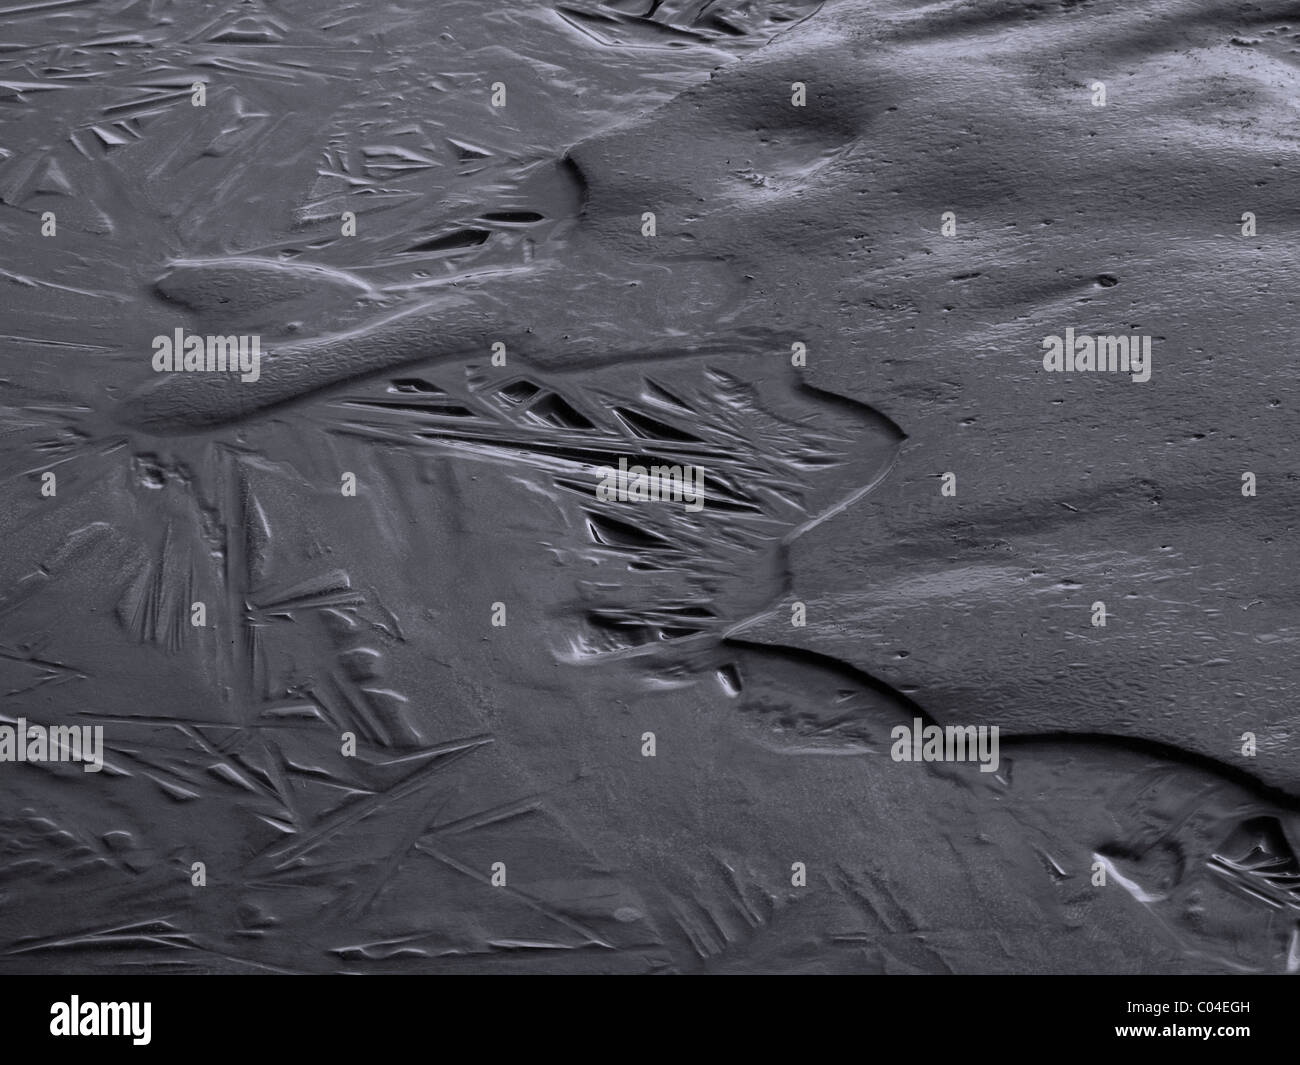 Ice like a metal - Stock Image